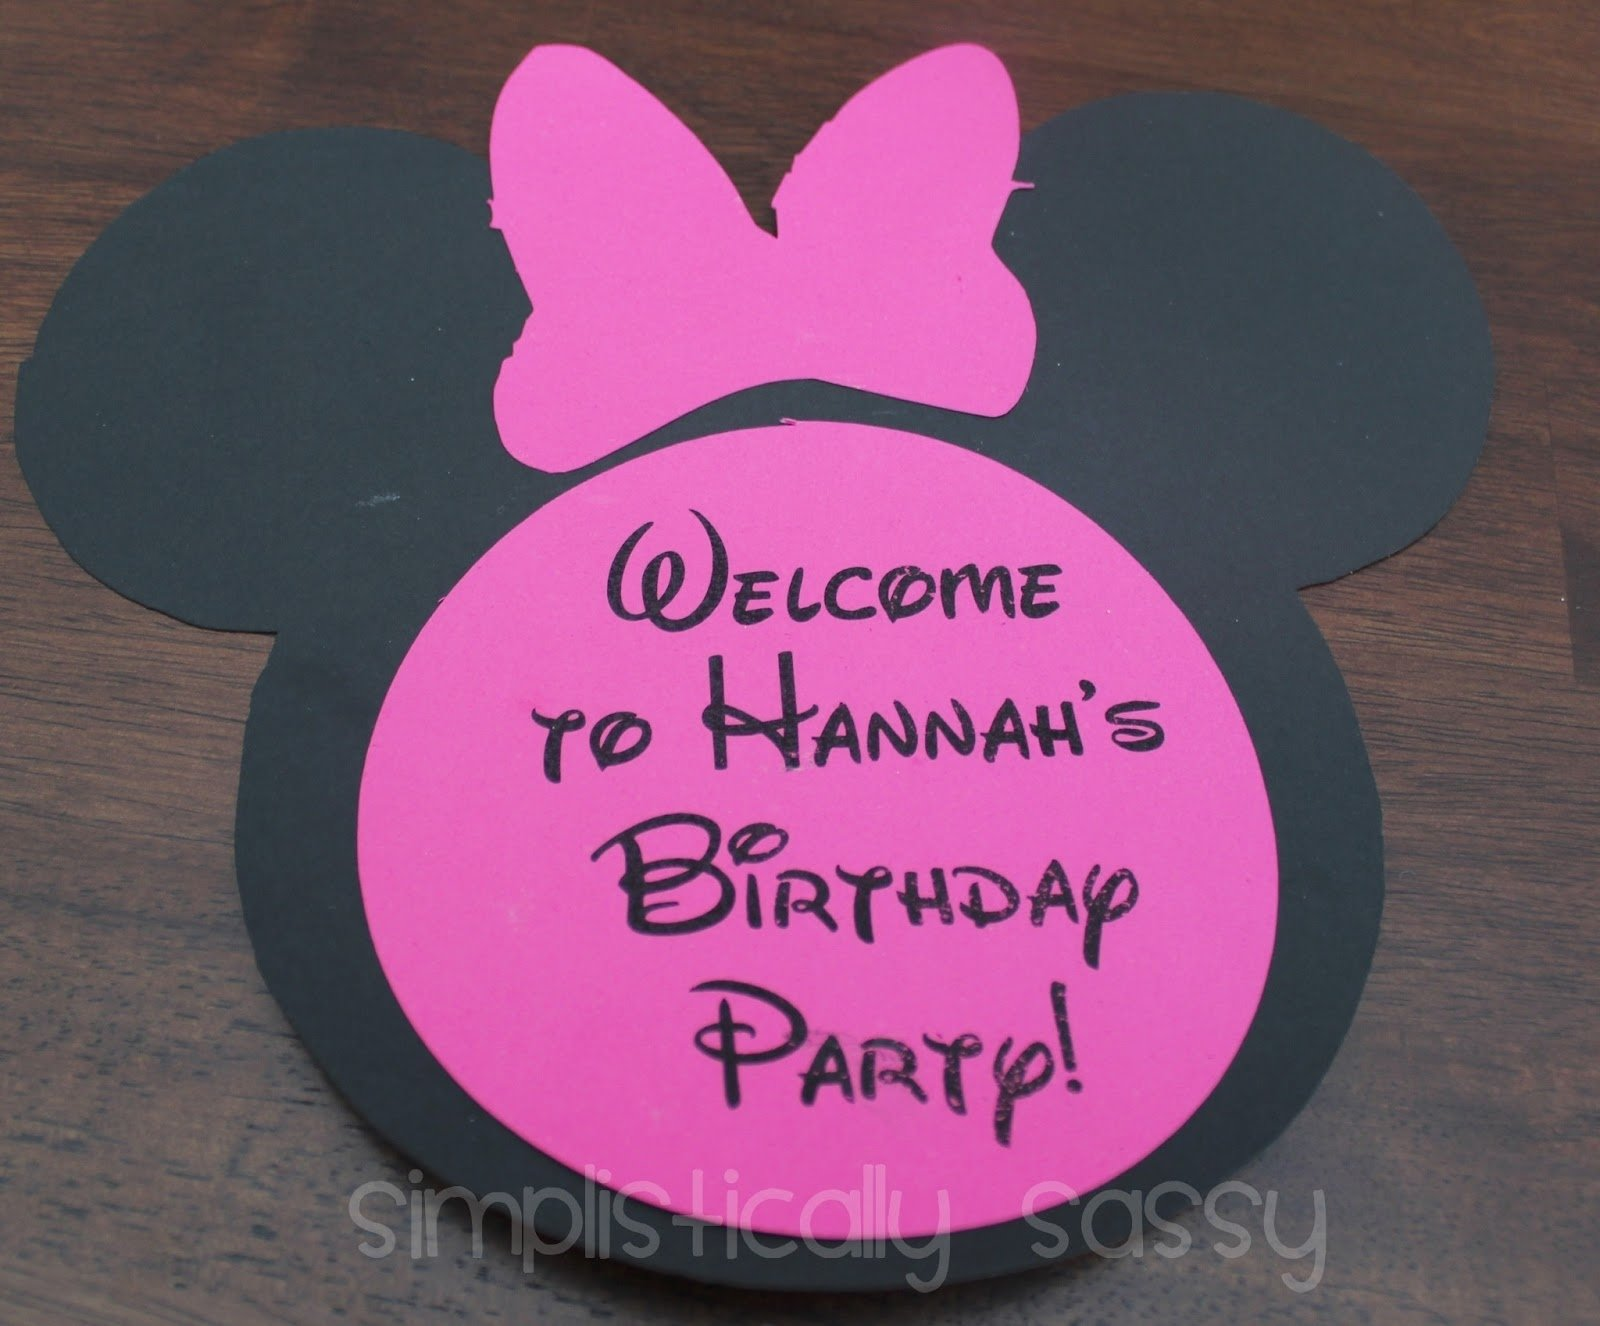 10 Elegant Minnie Mouse Birthday Party Ideas For A 2 Year Old mini minnie mouse birthday party on a budgetsimplistically sassy 2020